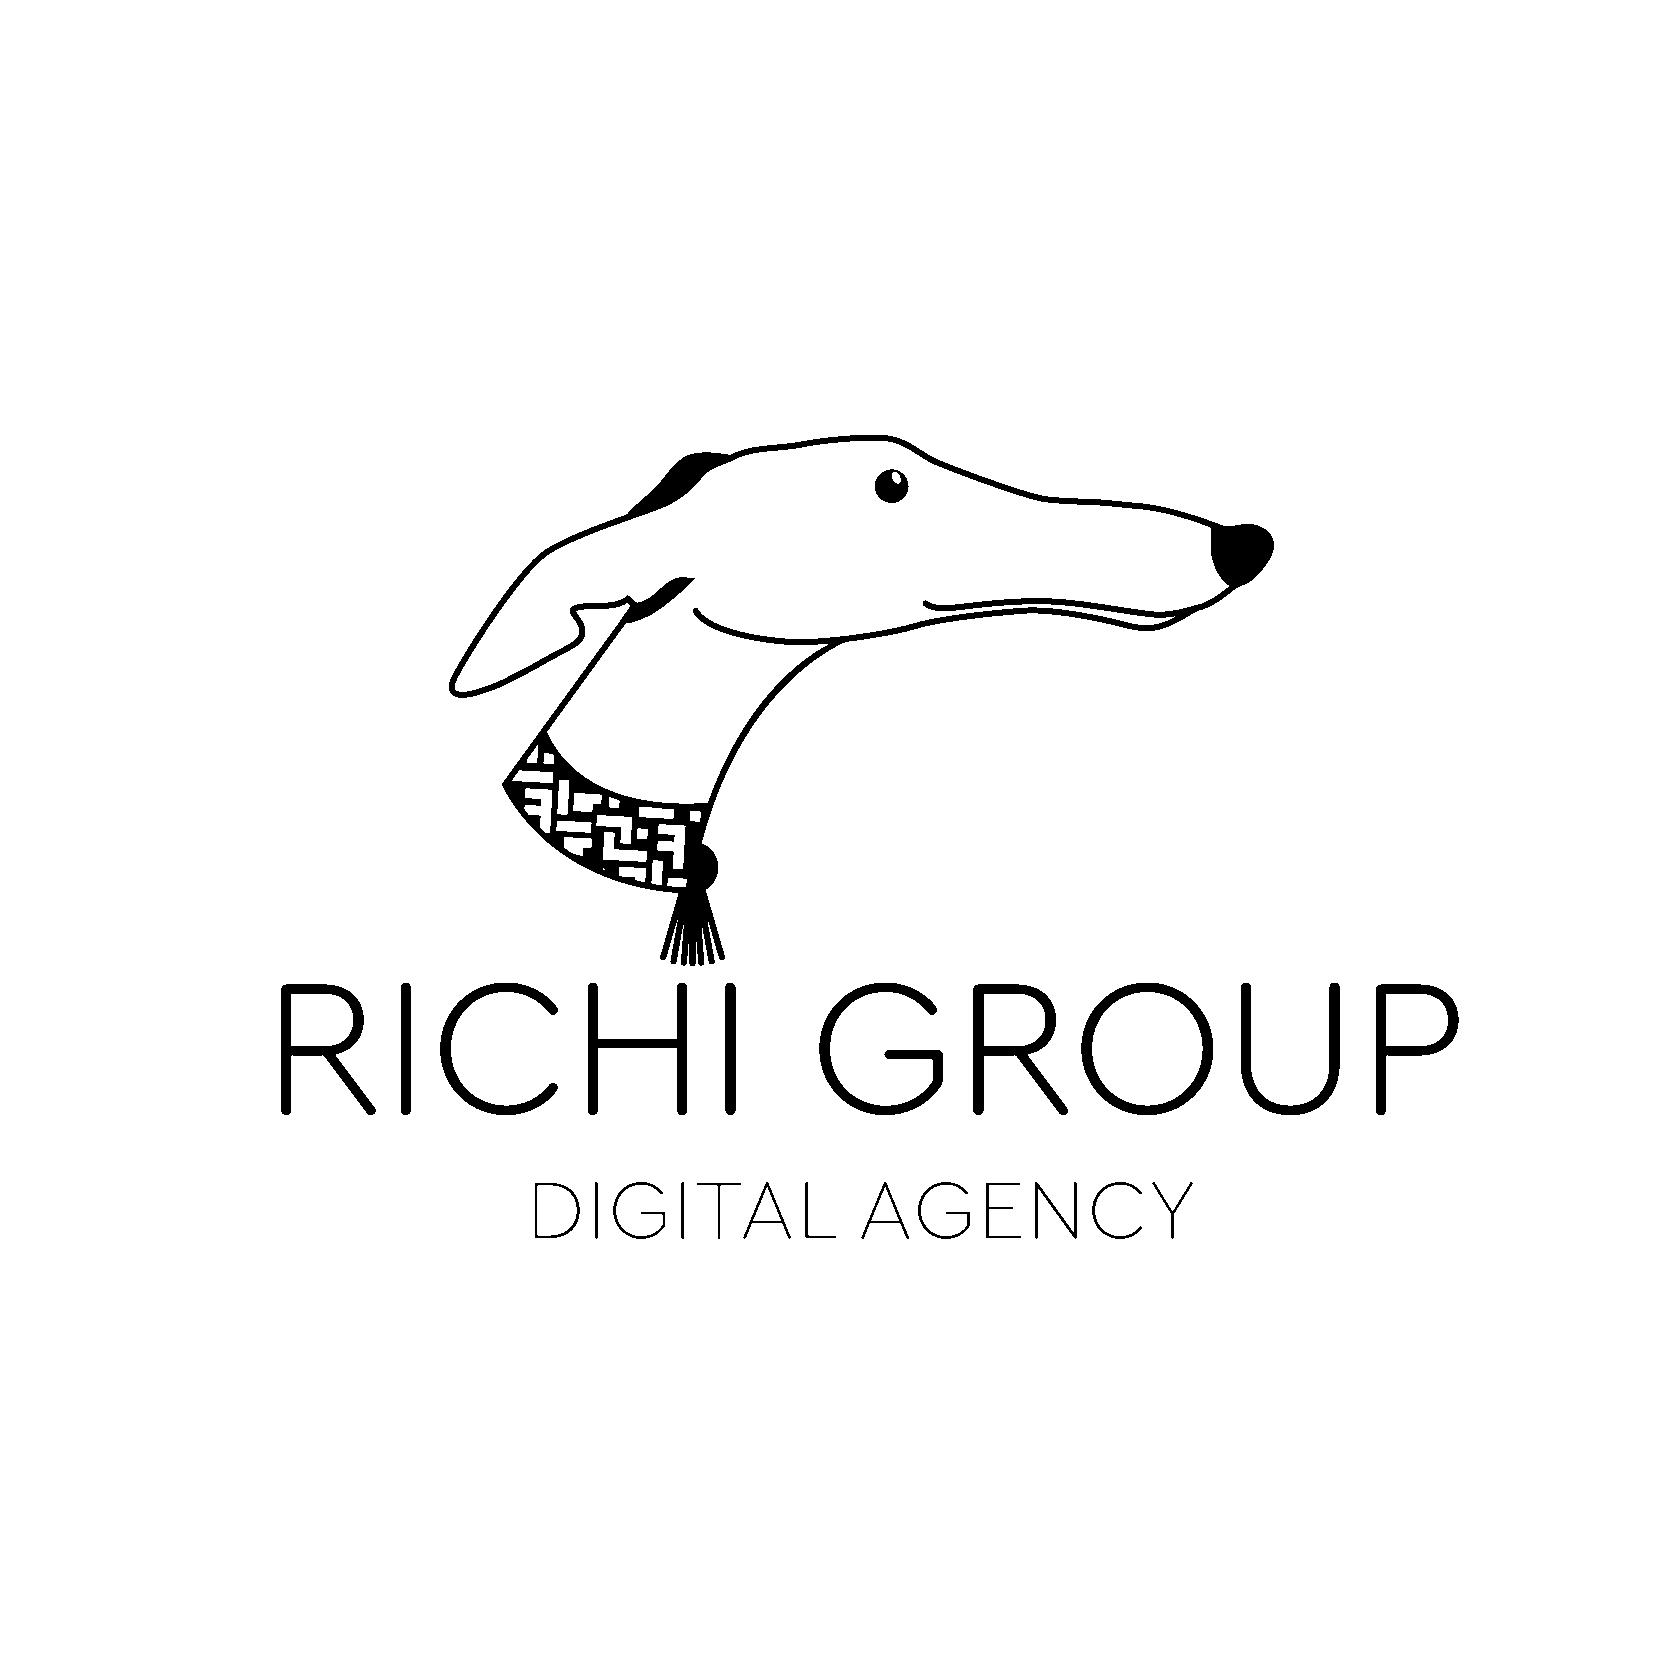 RICHI GROUP